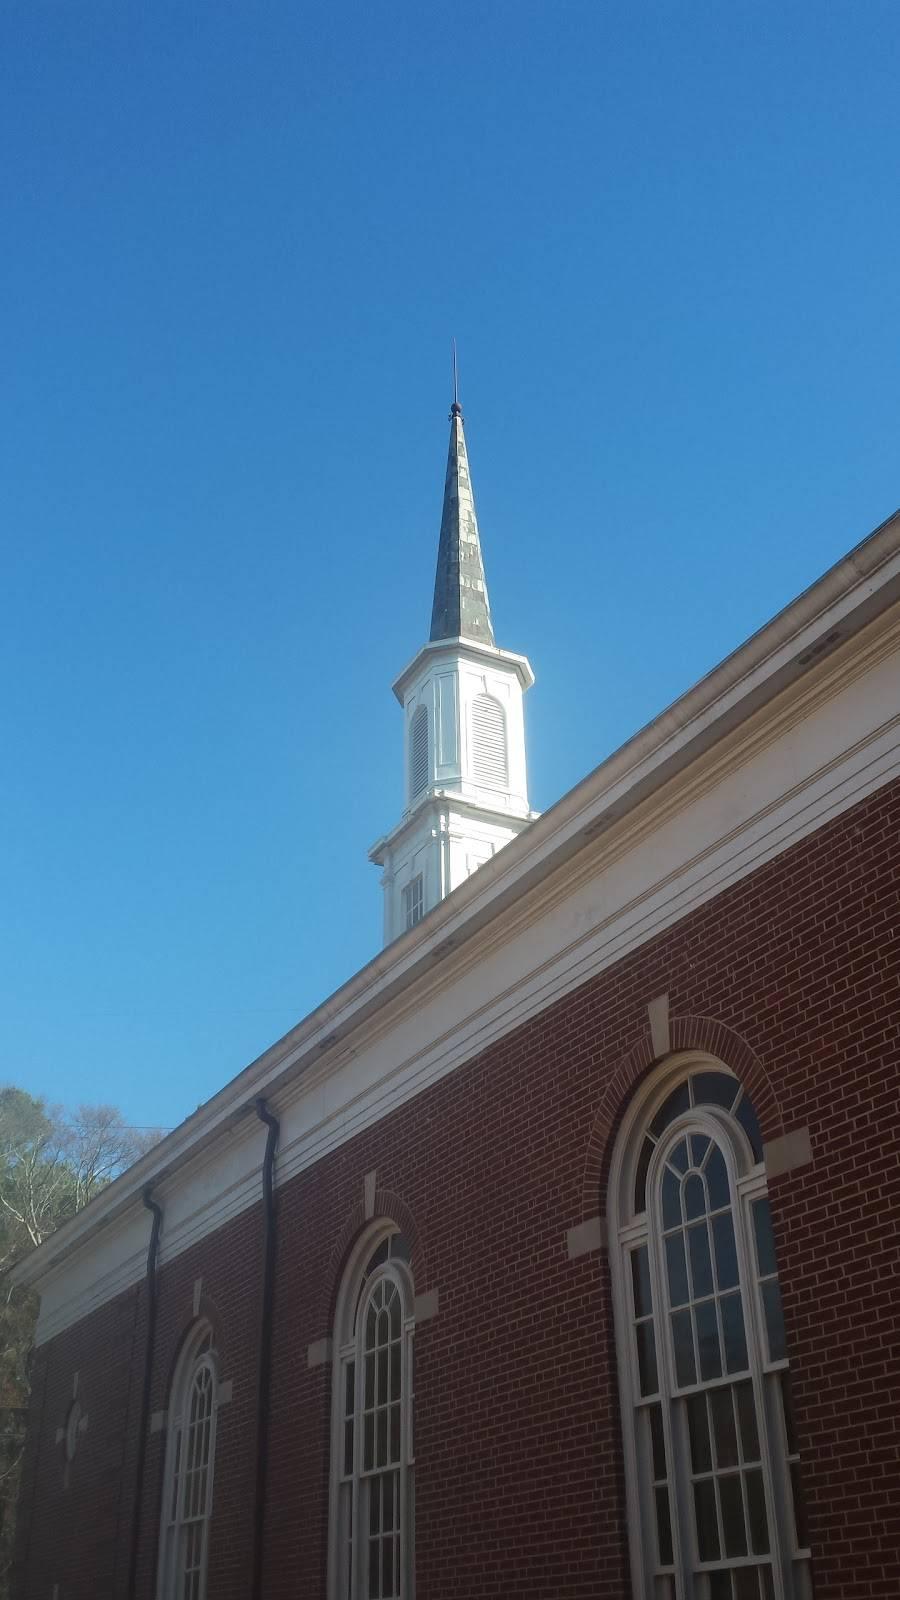 Columbia Presbyterian Church - church    Photo 2 of 3   Address: 711 S Columbia Dr, Decatur, GA 30030, USA   Phone: (404) 284-2441